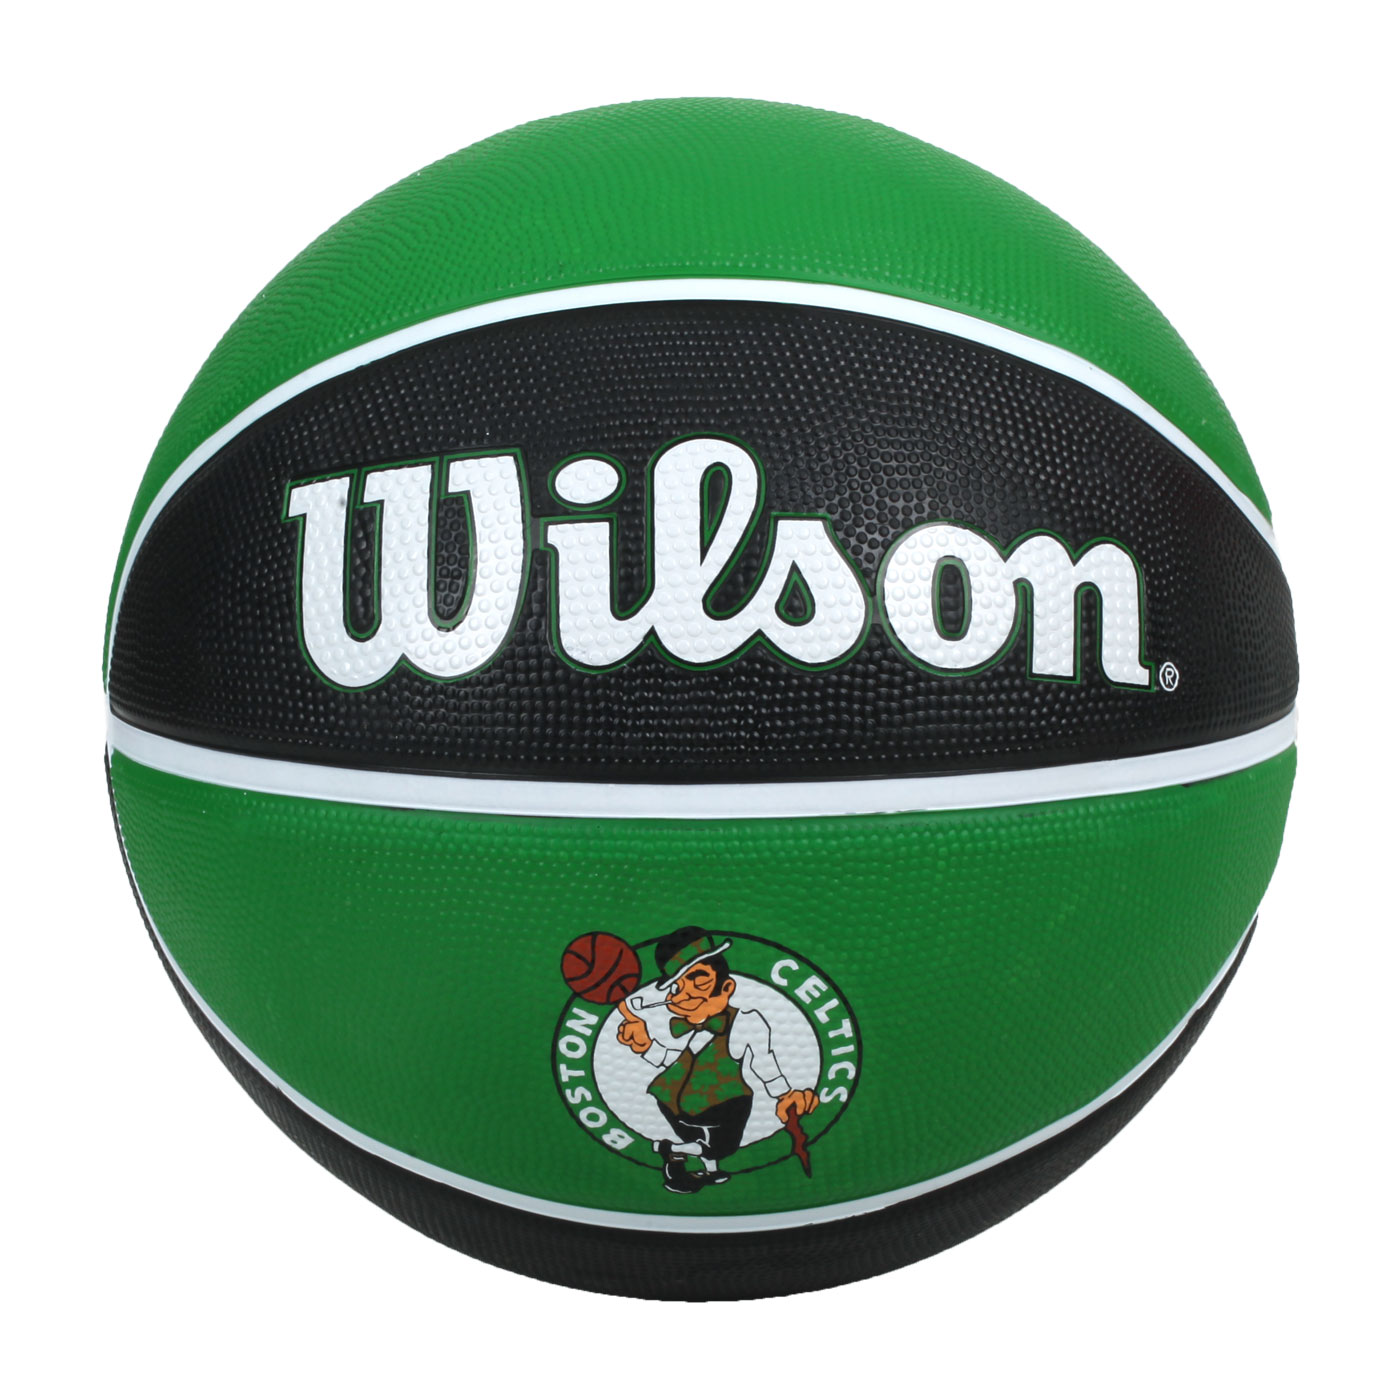 WILSON NBA隊徽系列21' 賽爾提克隊橡膠籃球#7 WTB1300XBBOS - 綠黑白